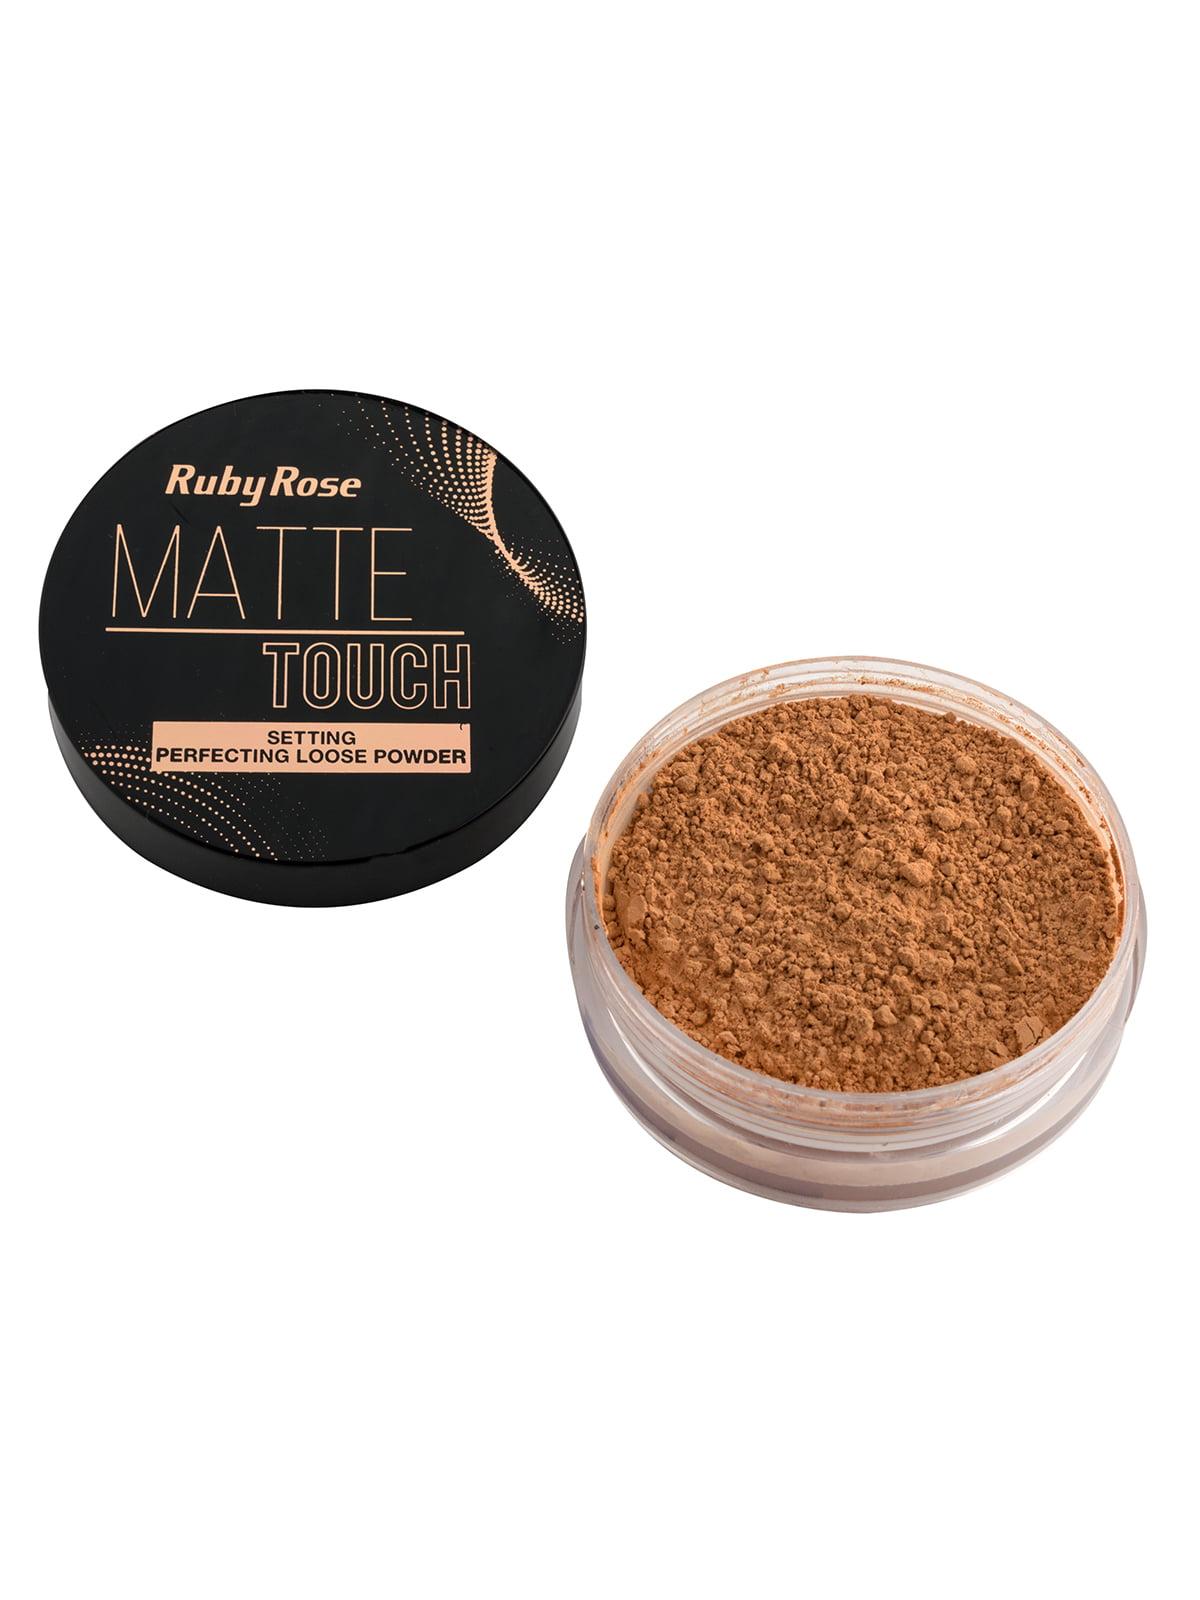 Пудра розсипчата Matte Touch Setting Perfectiing Loose Powder (8,5 г) | 5223496